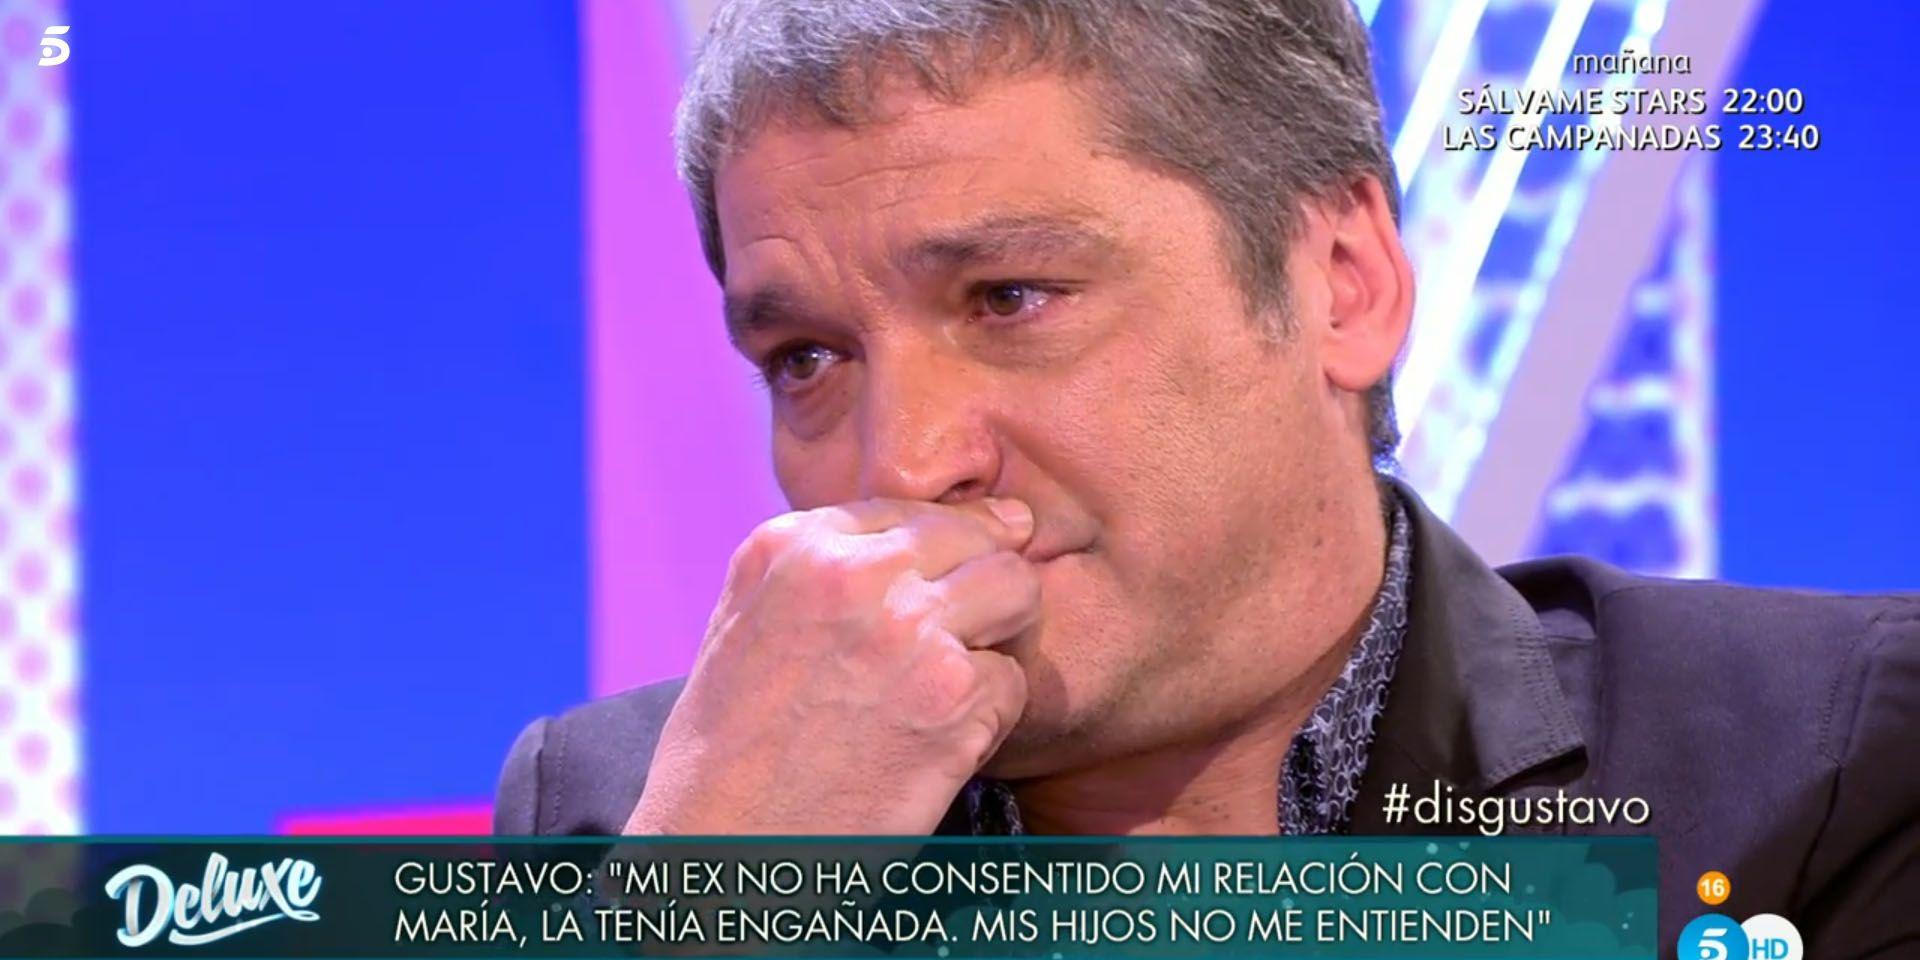 https://www.diezminutos.es/famosos-corazon/especiales/news ...